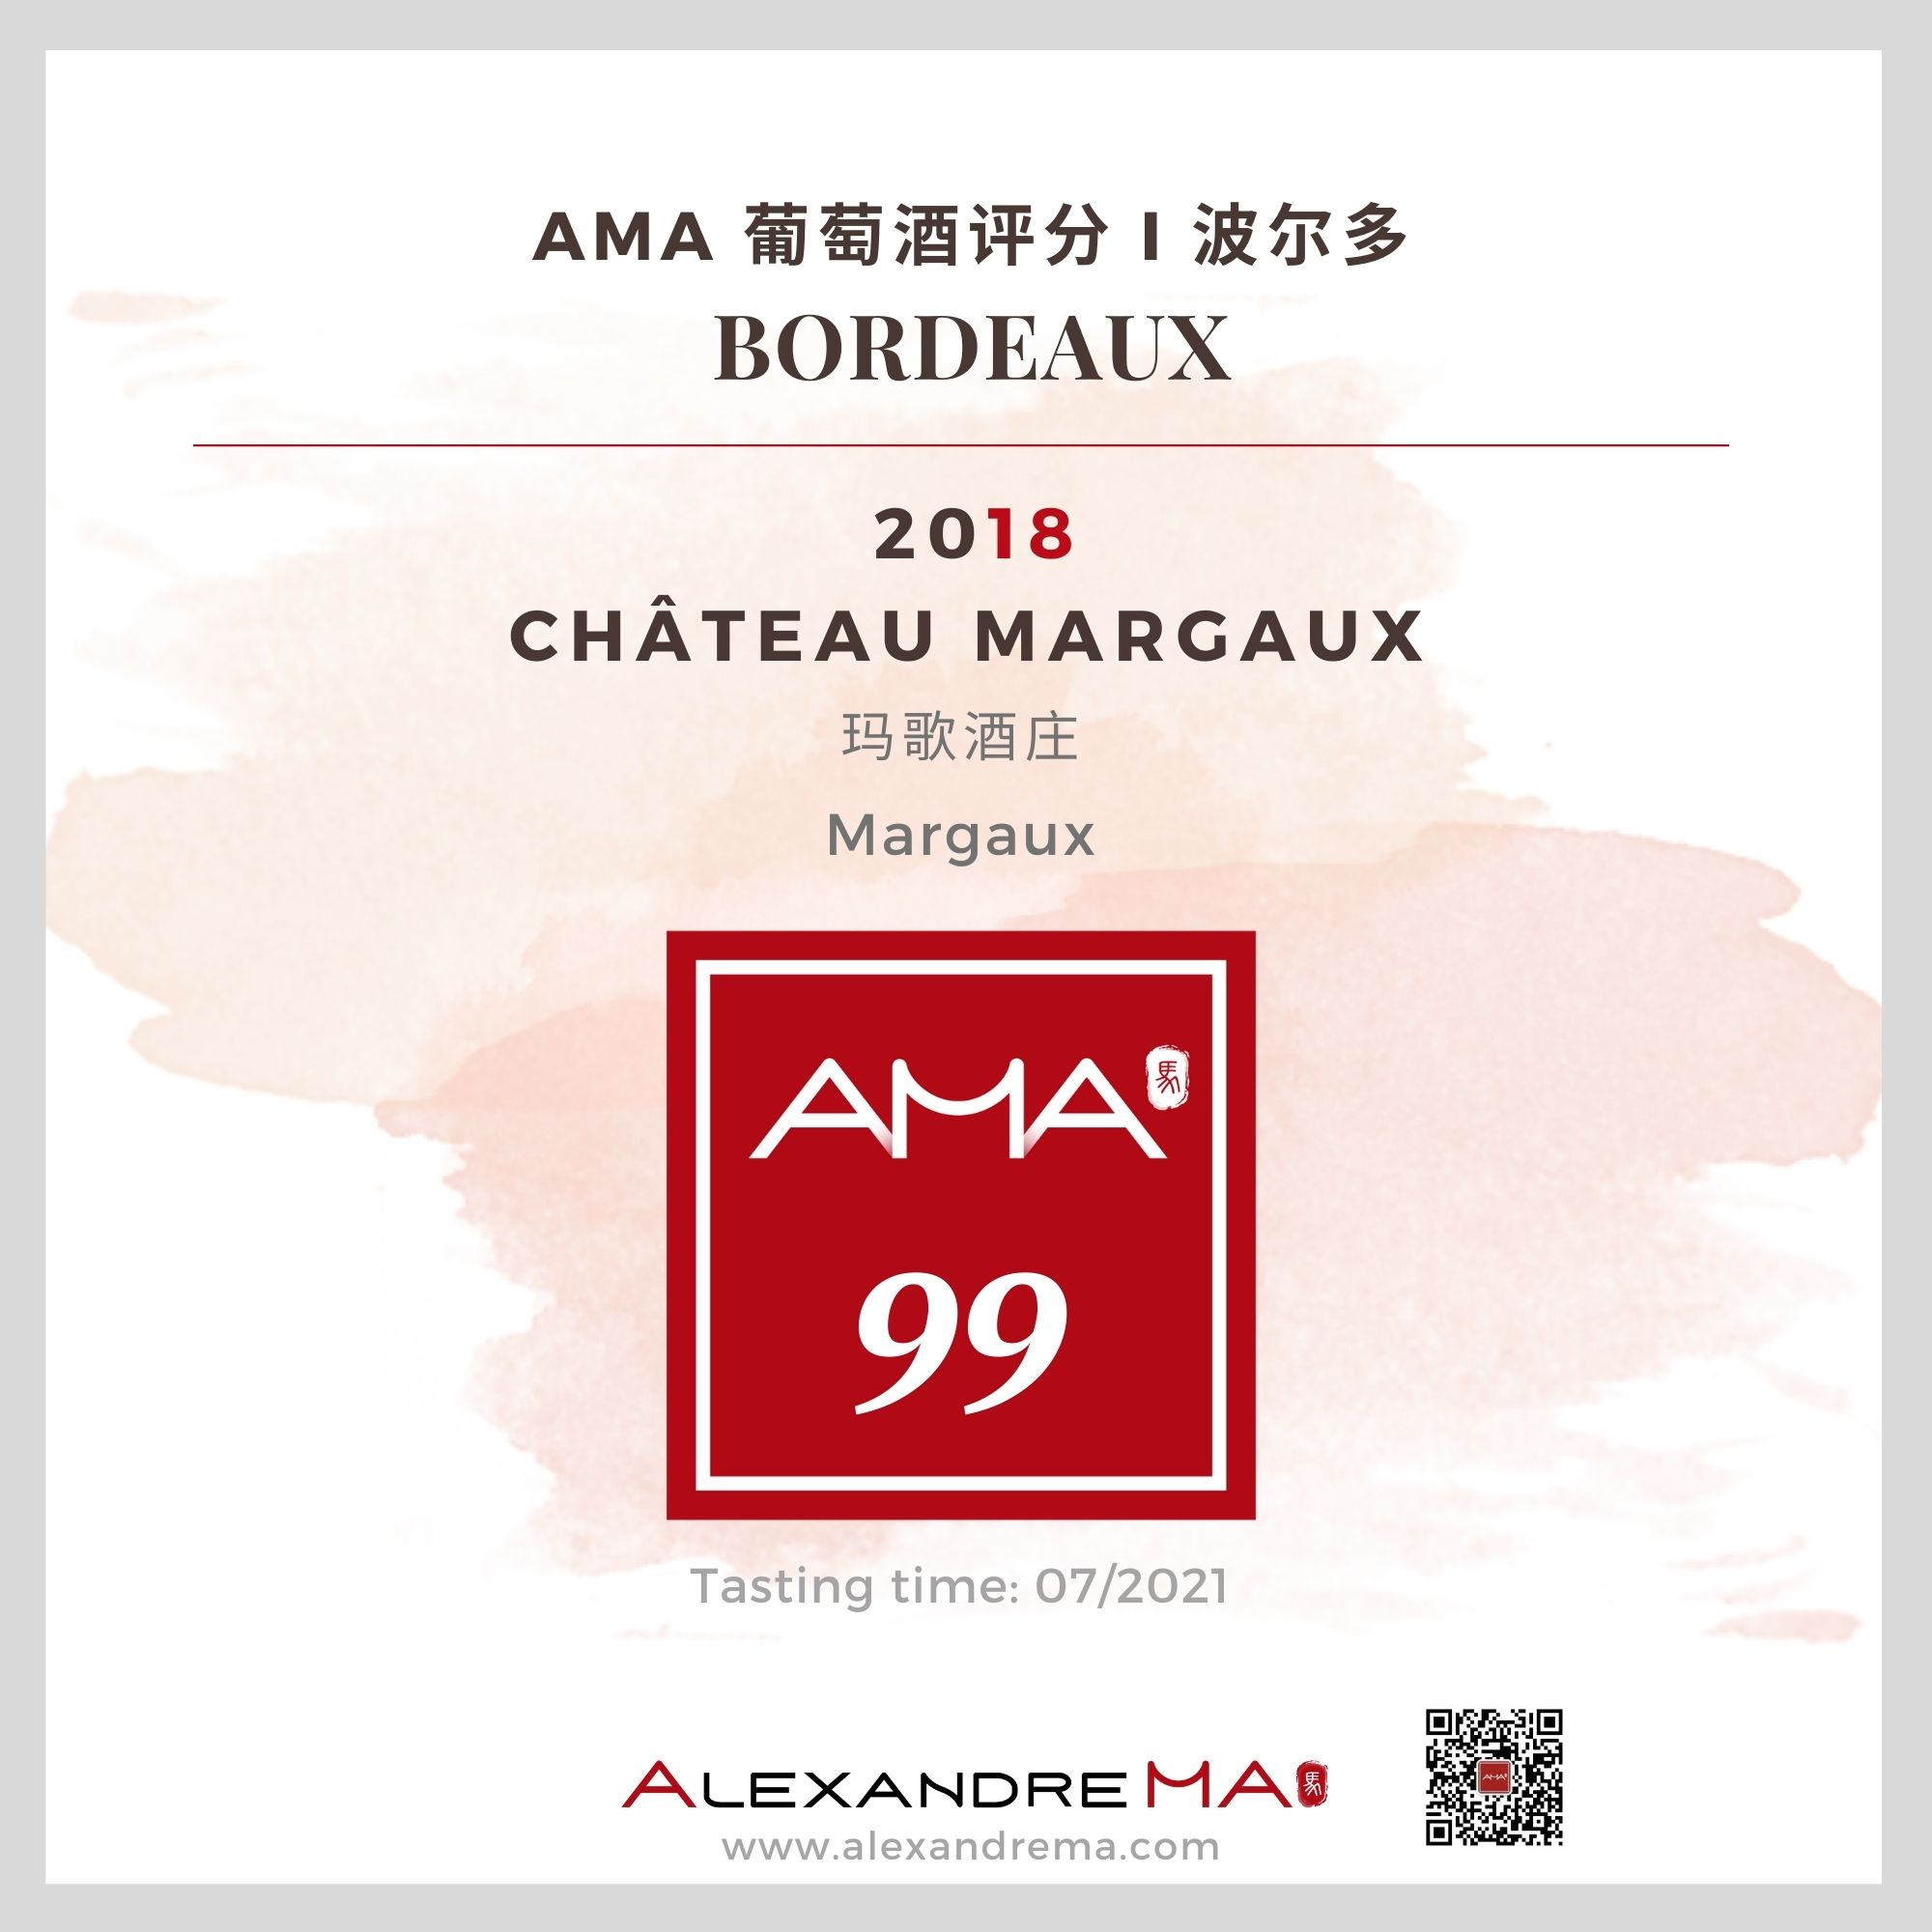 Château Margaux 2018 - Alexandre MA